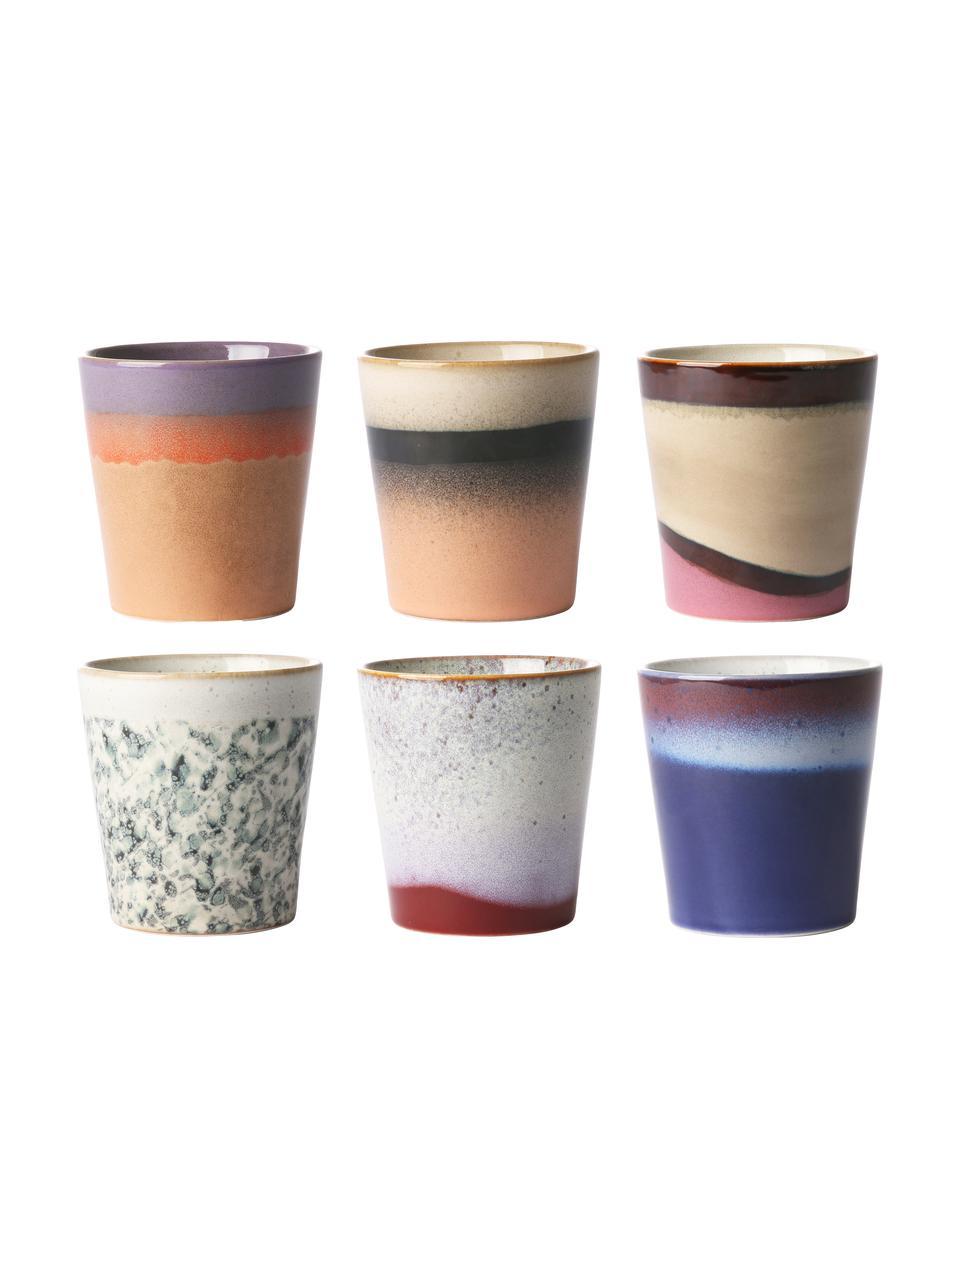 Set 6 tazze retrò senza manico fatte a mano 70's, Ceramica, Multicolore, Ø 8 x Alt. 8 cm